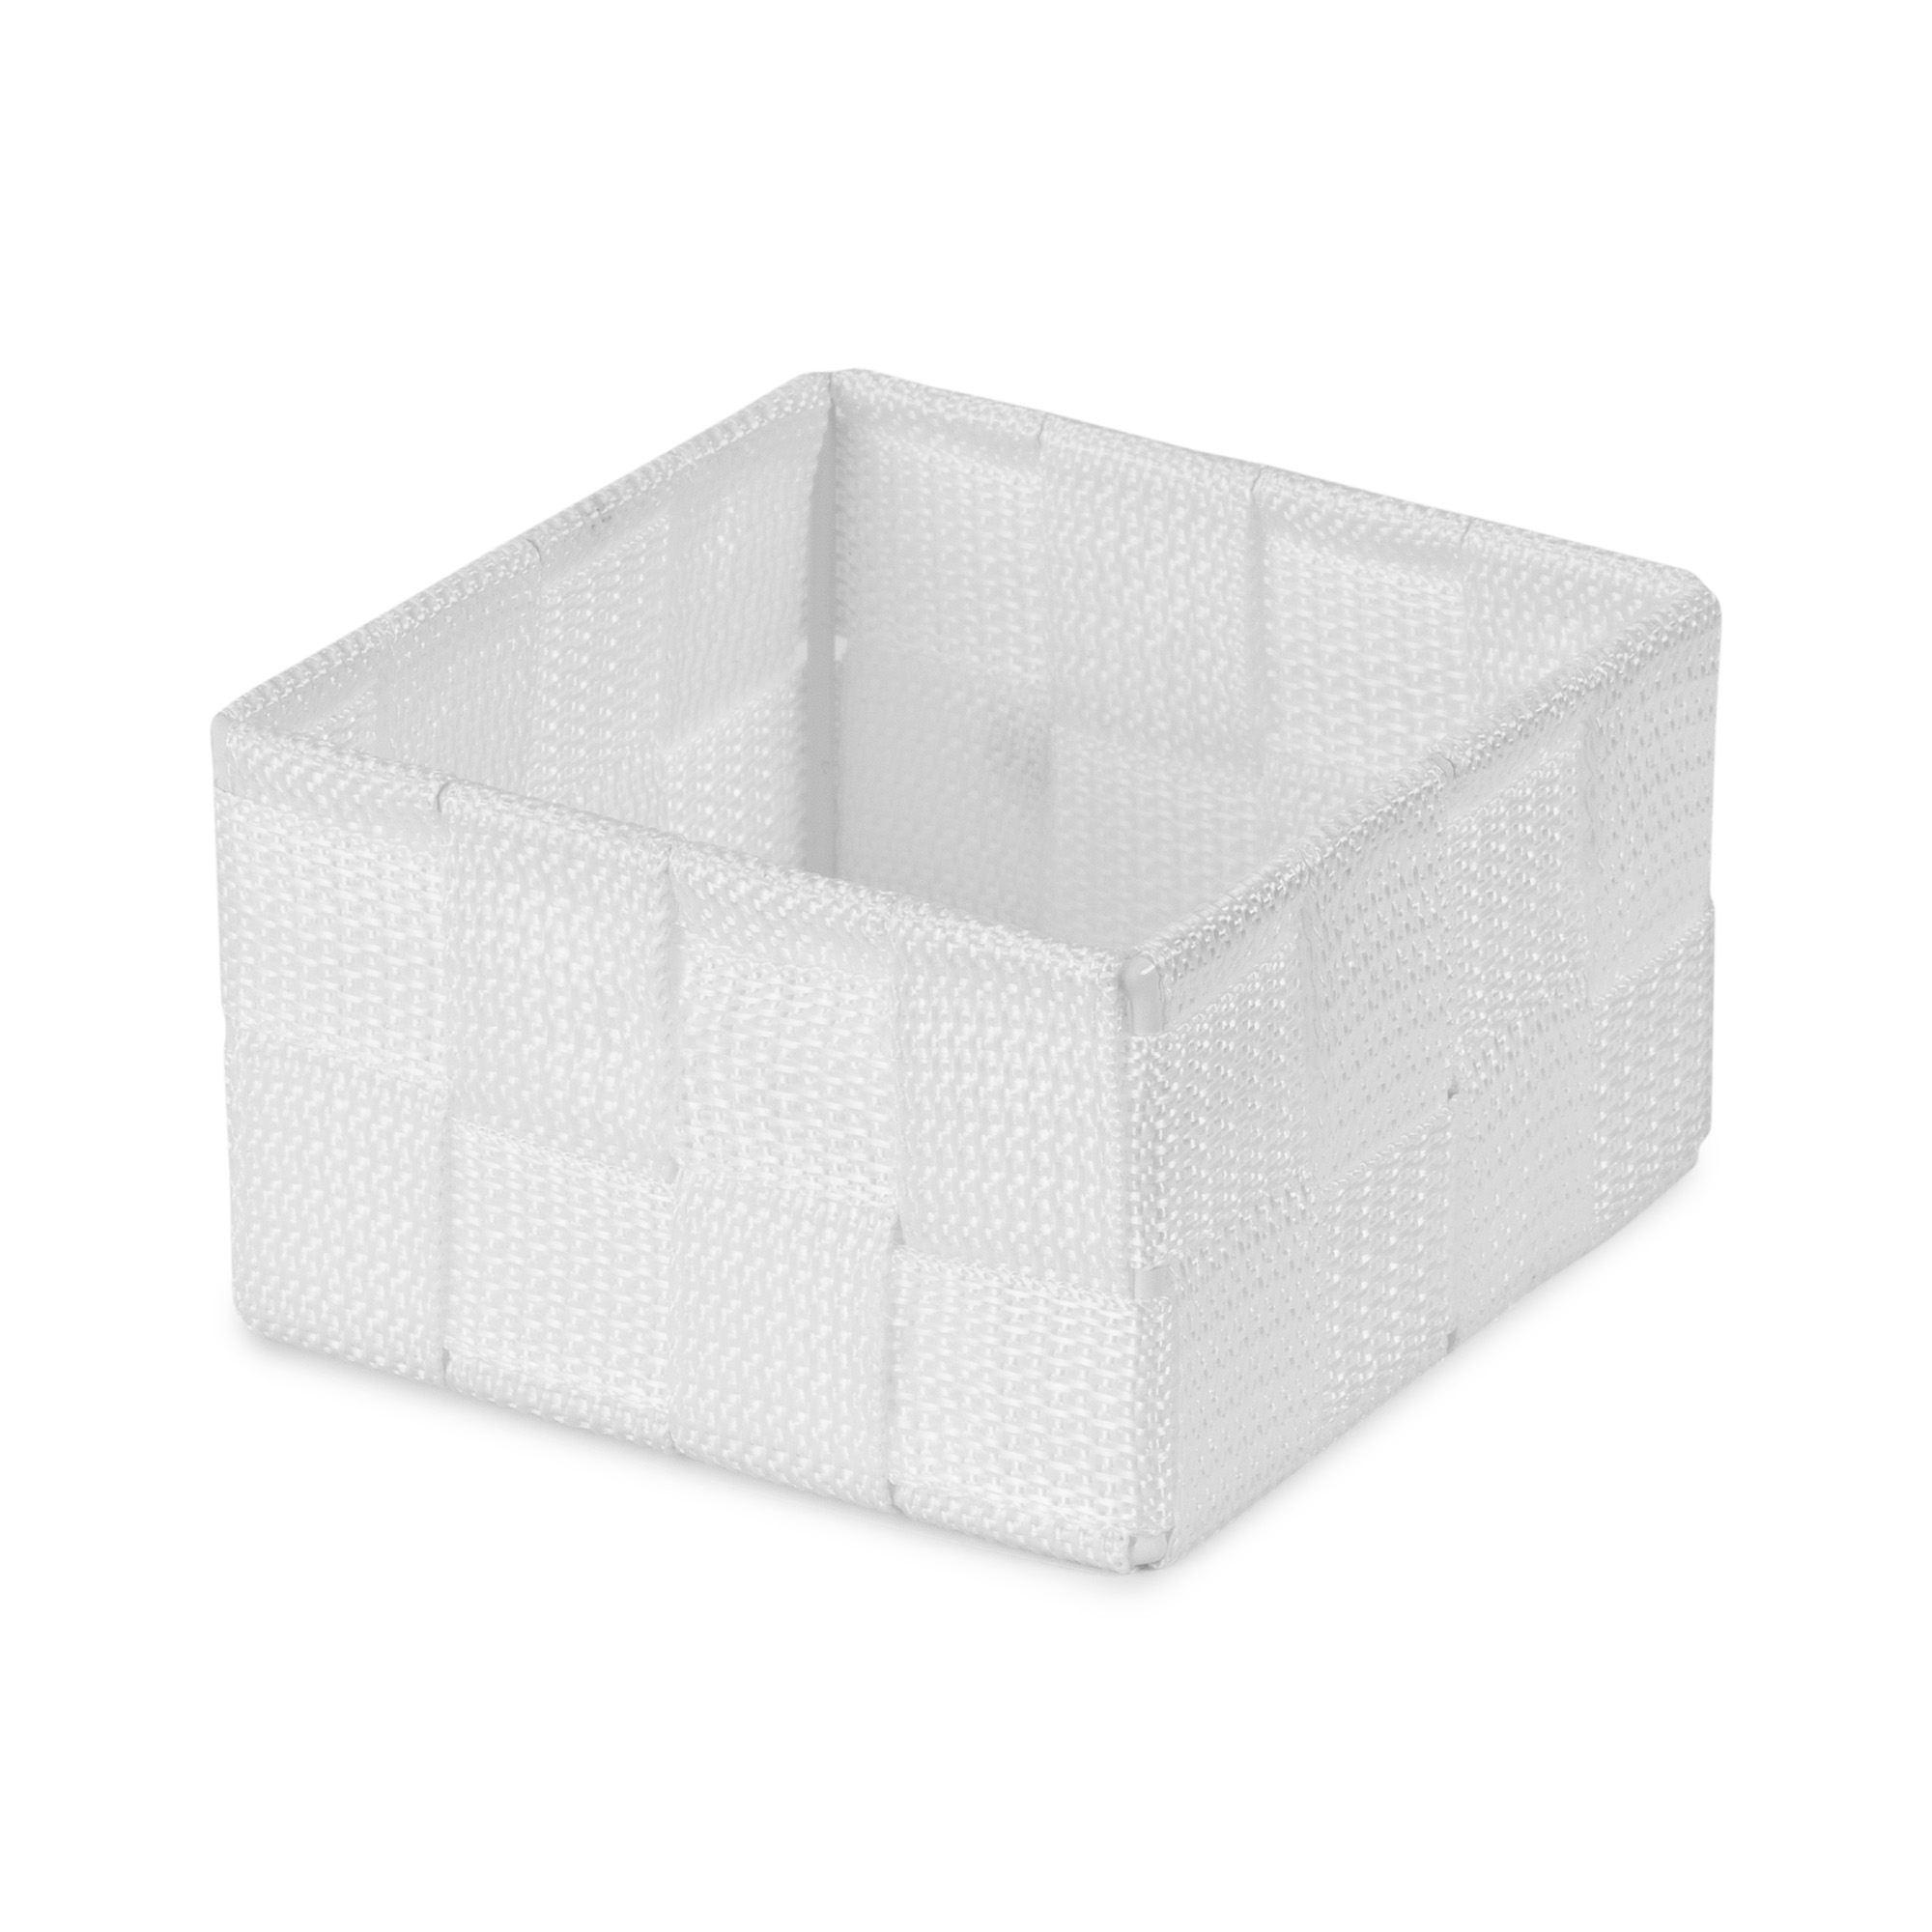 Organisateur de tiroir blanc 12x12cm